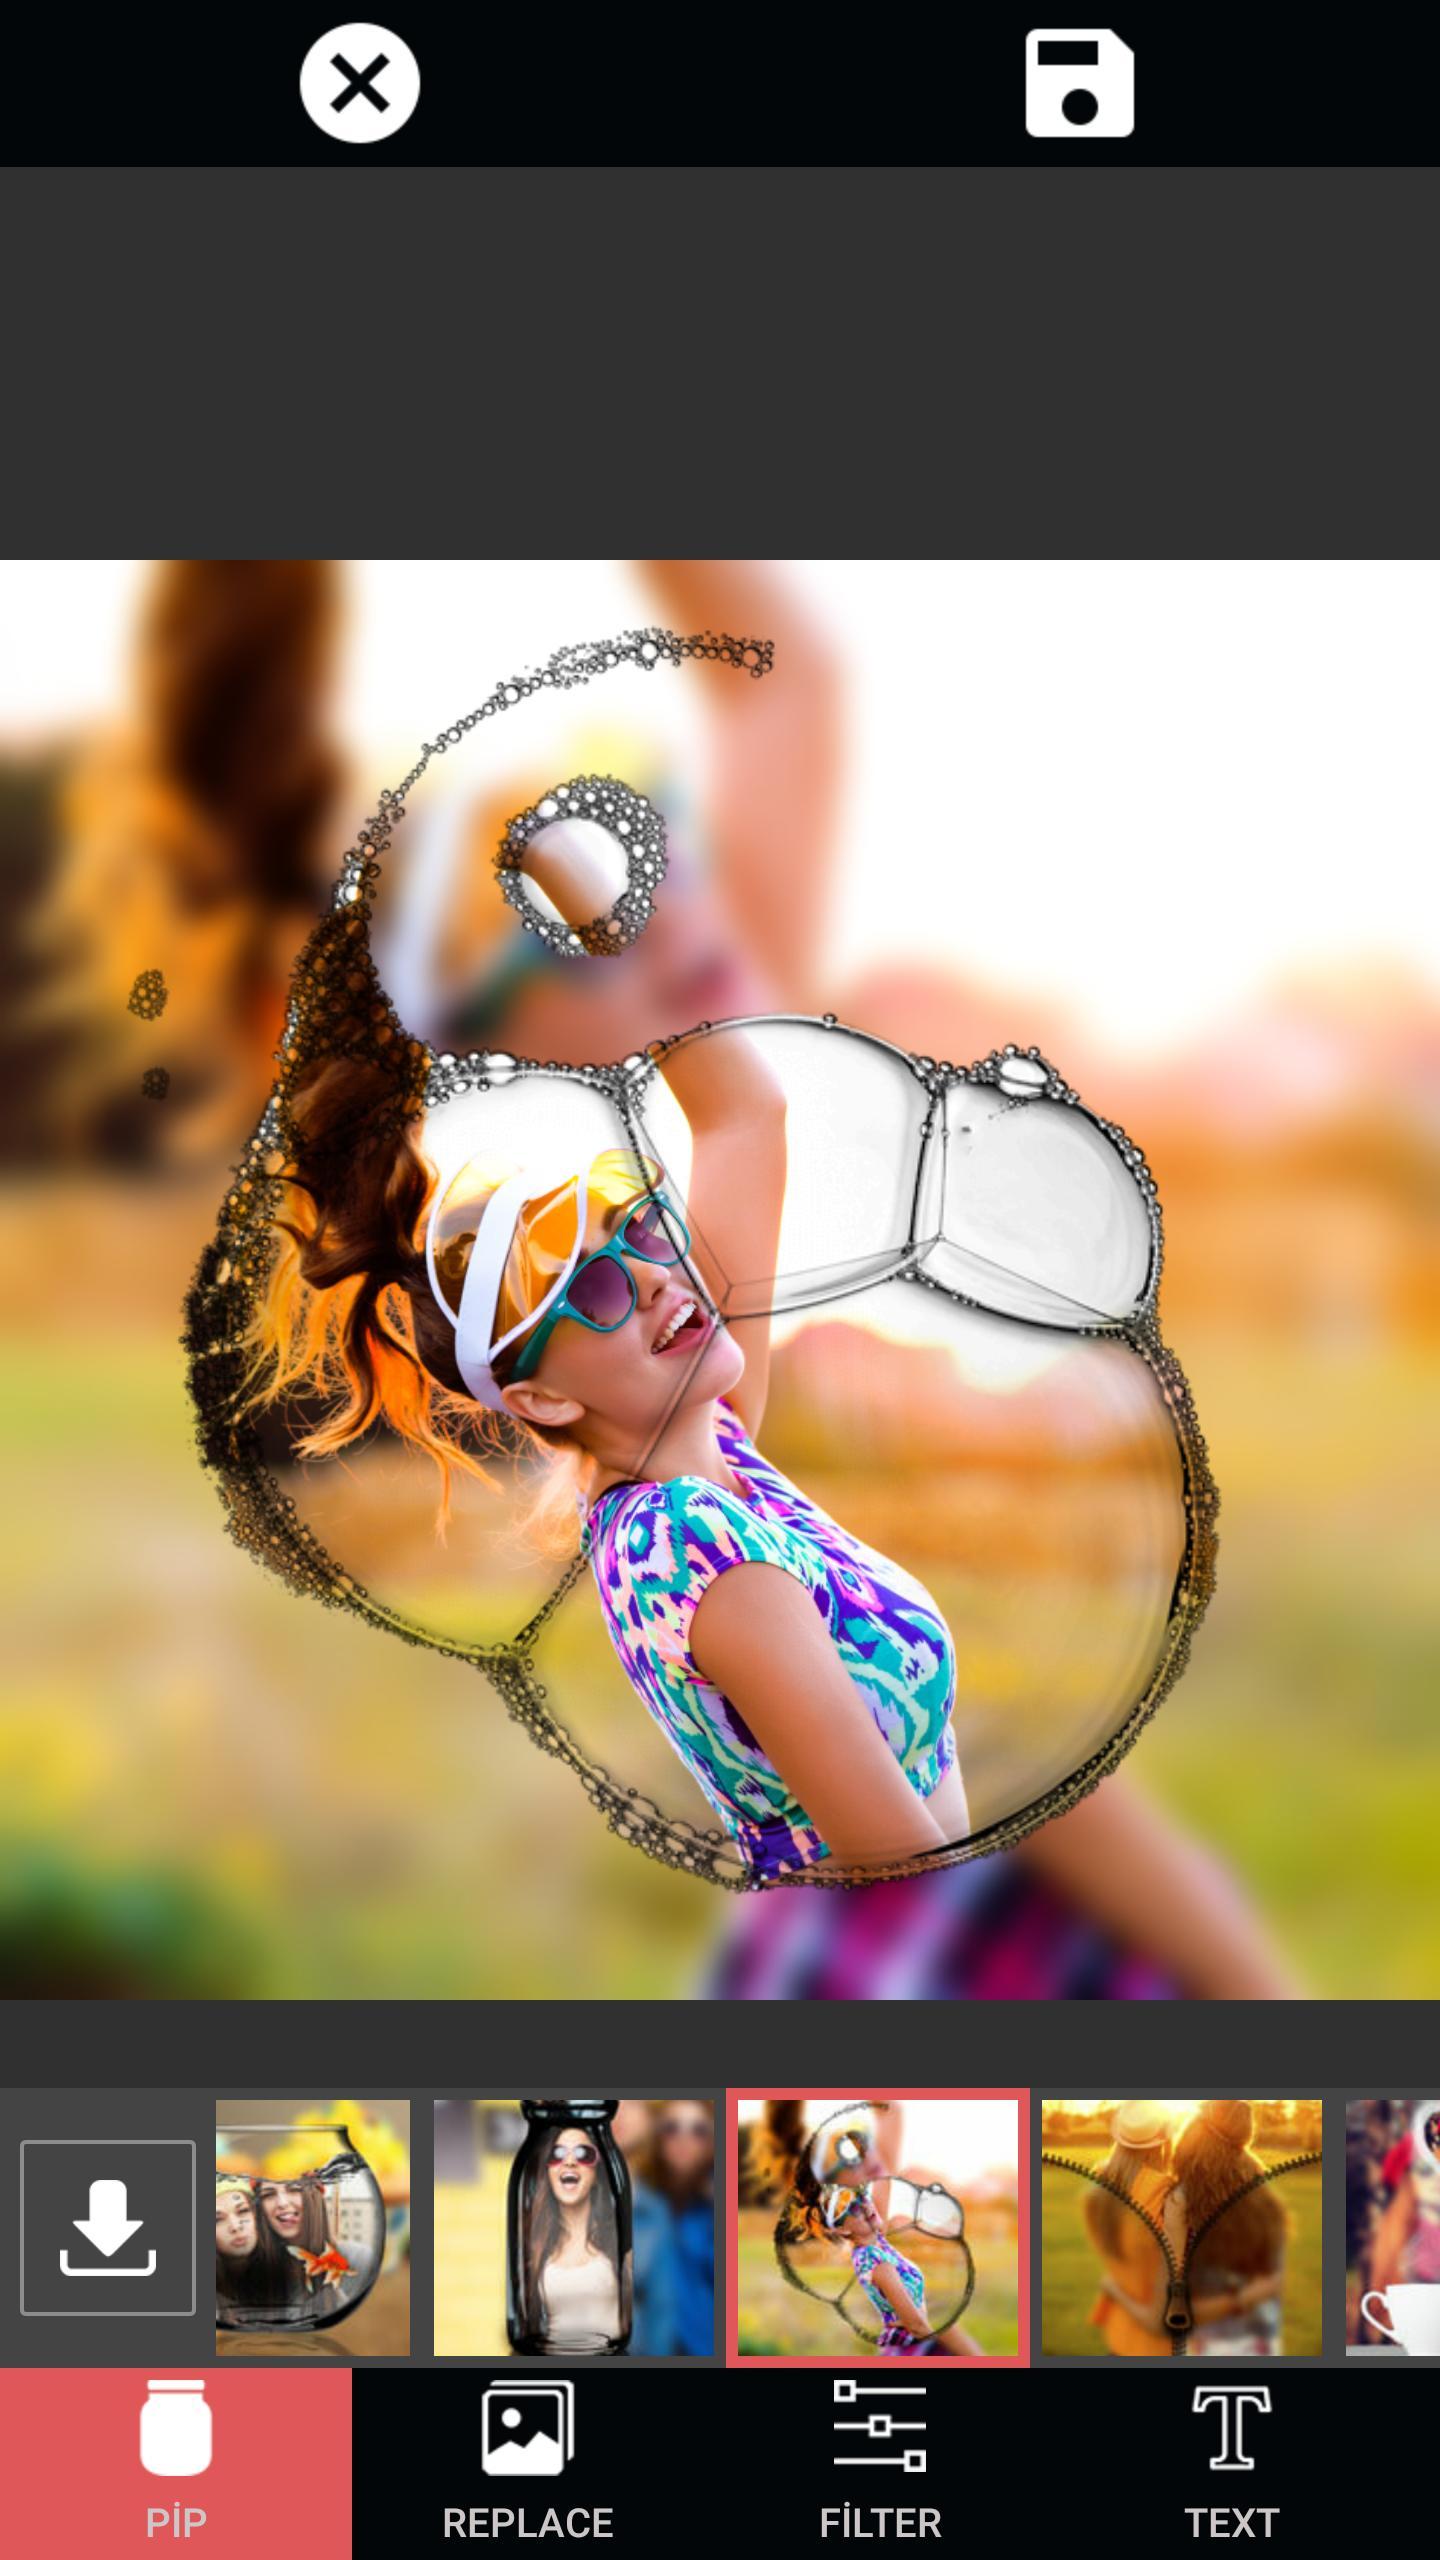 Selfie Camera Editor: Take Selfies & Edit Photos 2.2.2 Screenshot 4